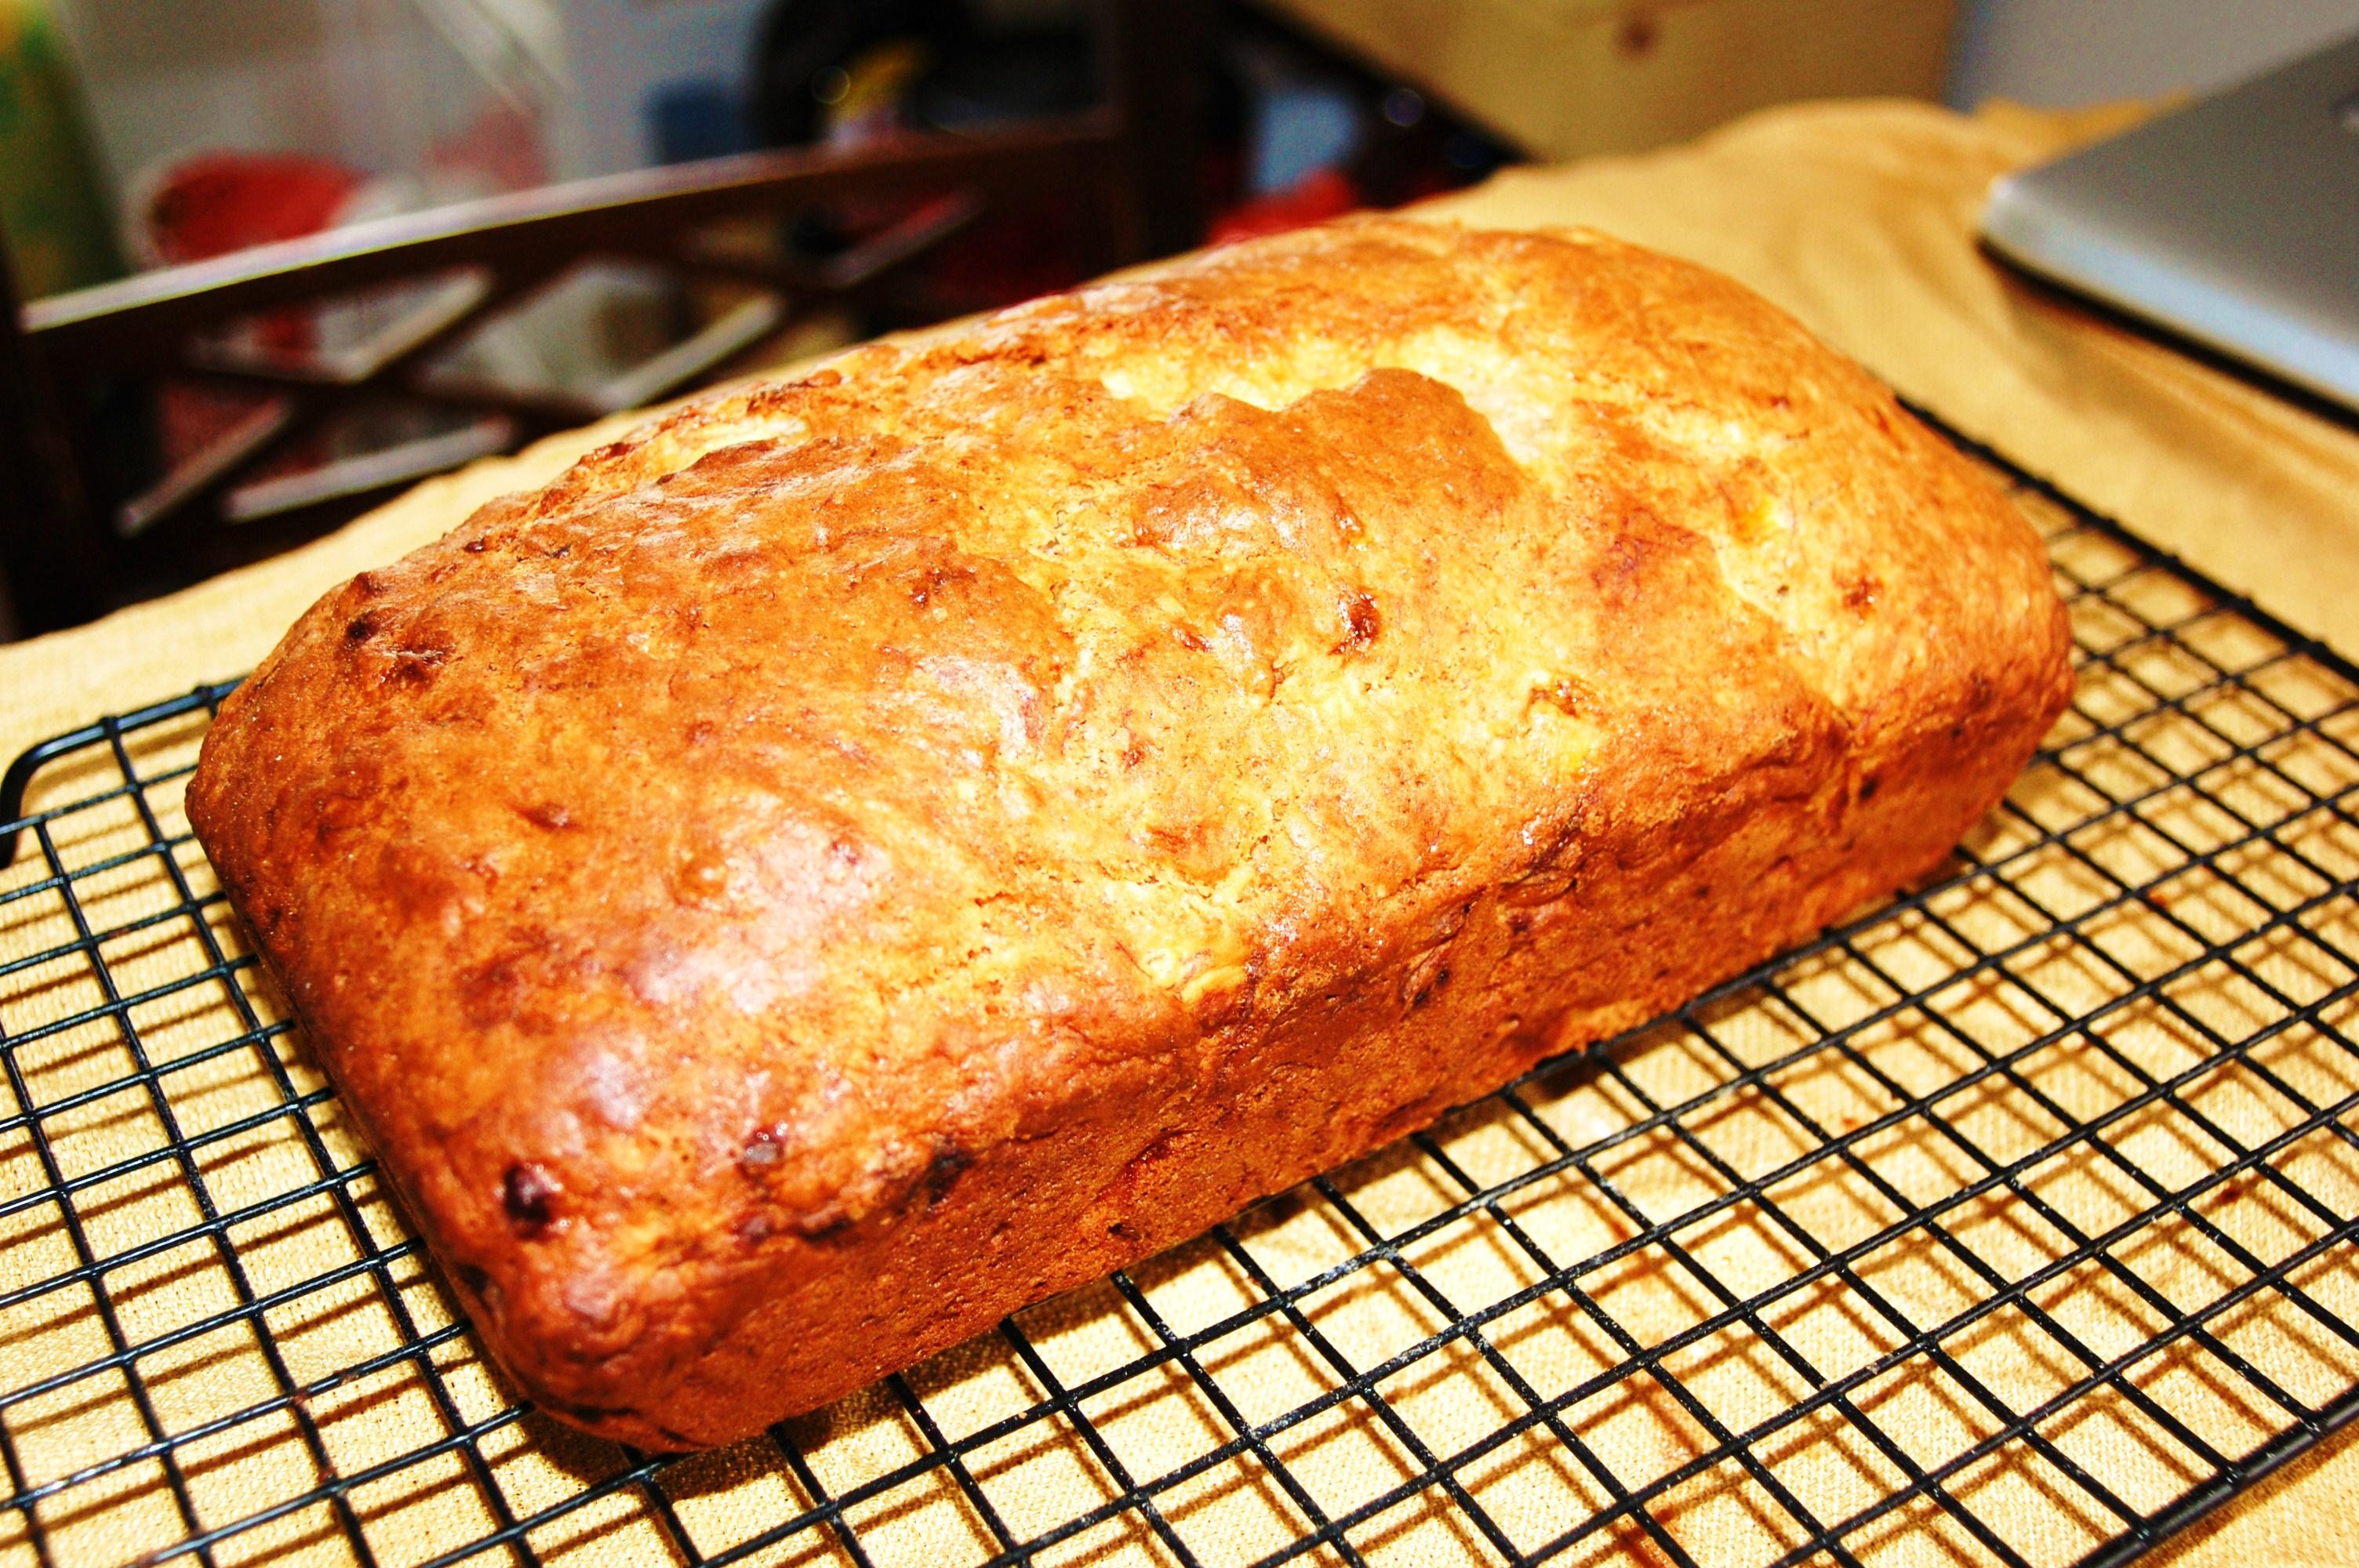 baking n stuff 006